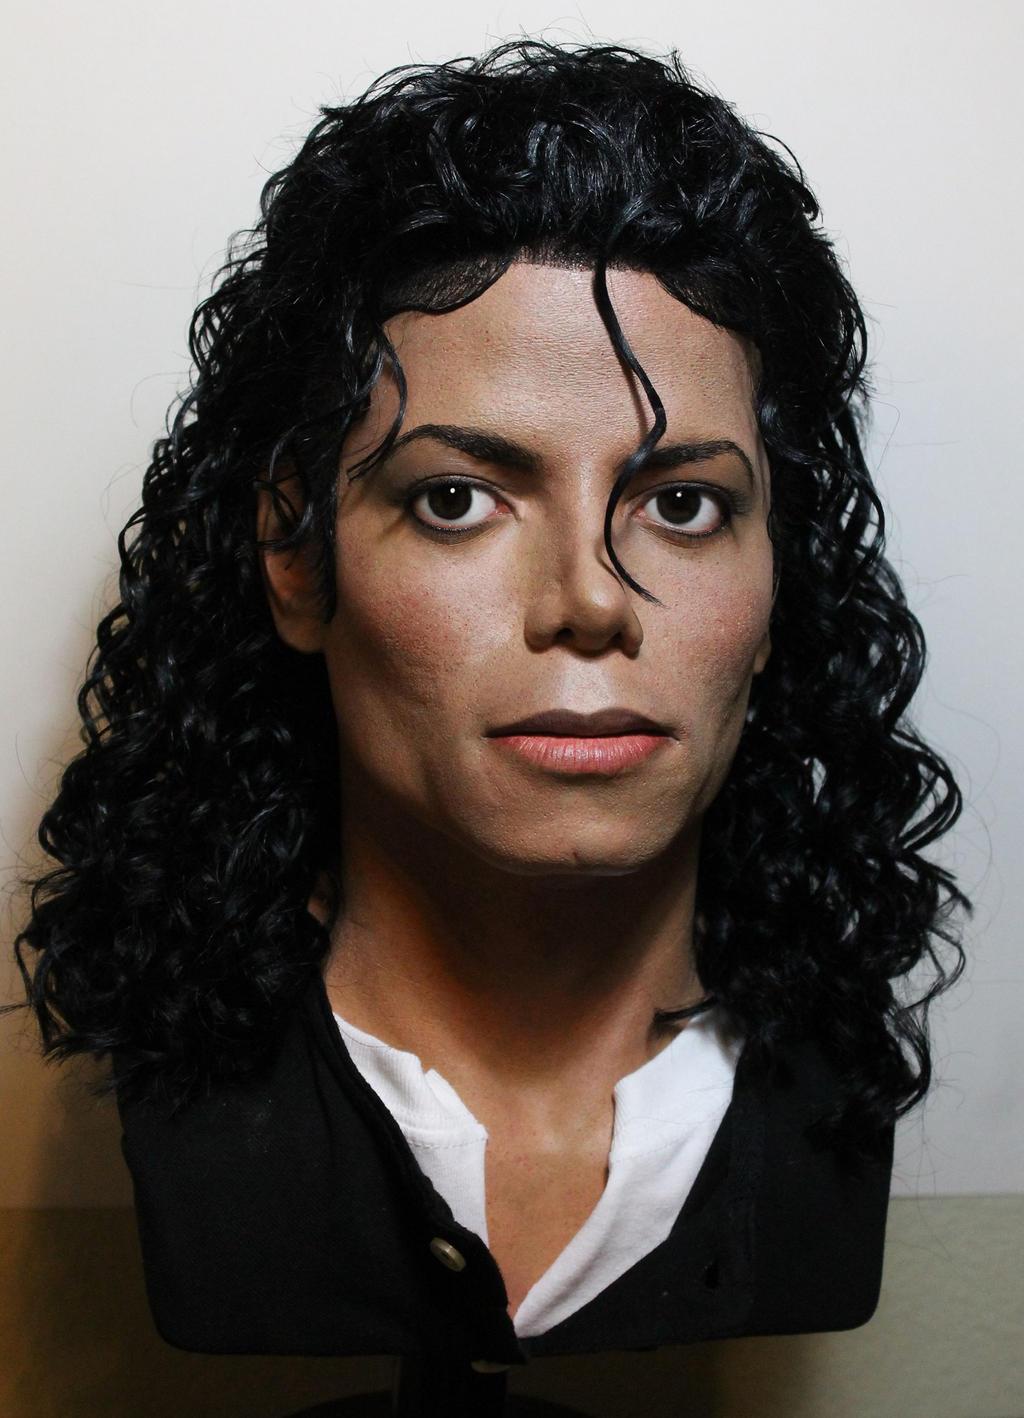 Busti raffiguranti Michael Jackson quasi alla perfezione Michael_jackson_lifesize_bad_era_moonwalker_bust_by_godaiking-d81ecf1